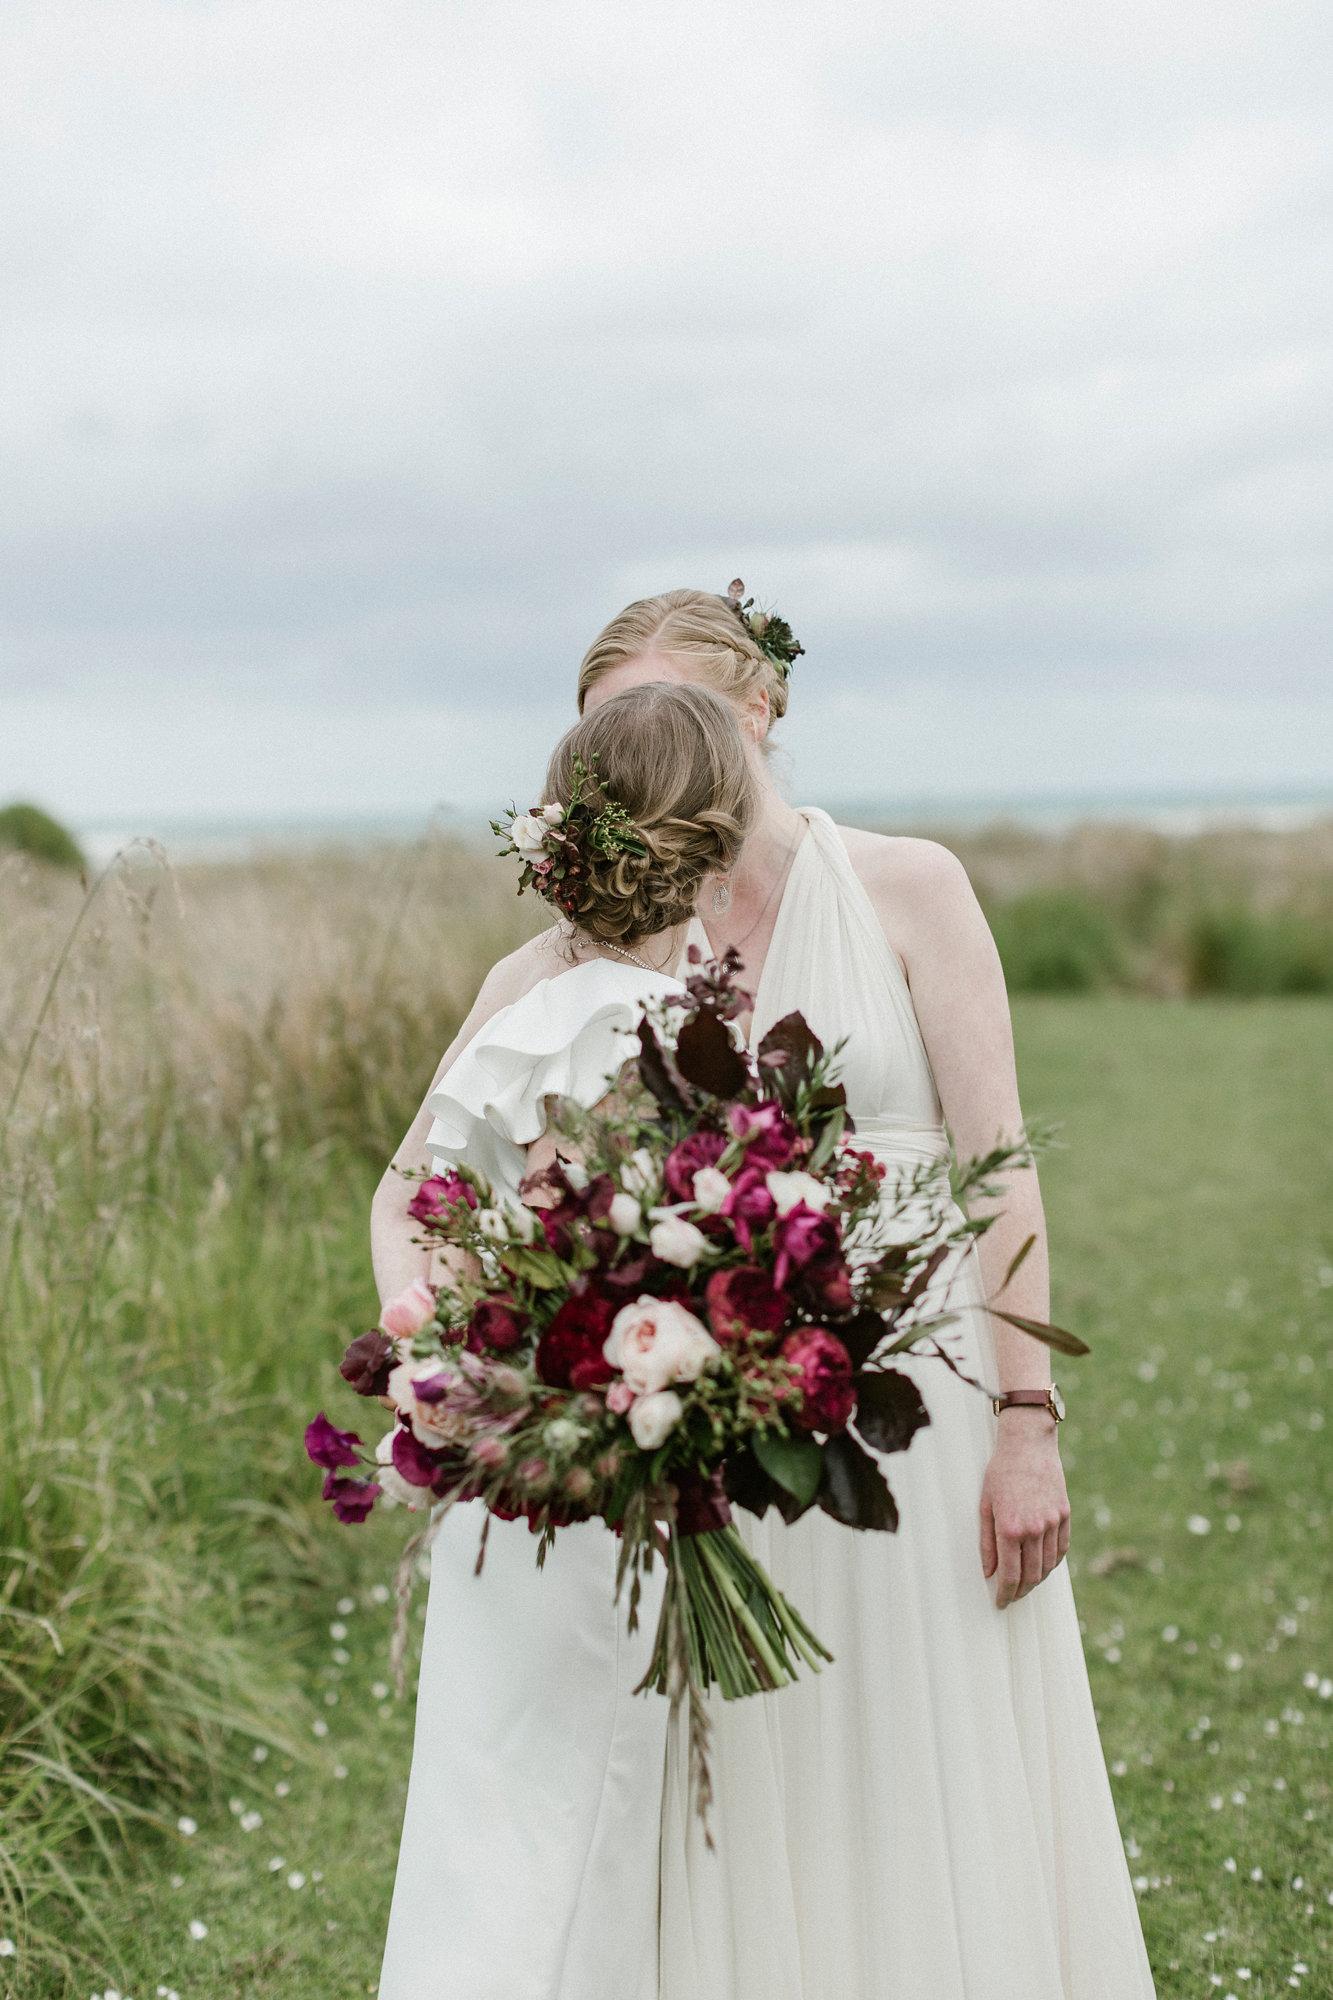 HANNAH_ROSE_WEDDING_1.jpg